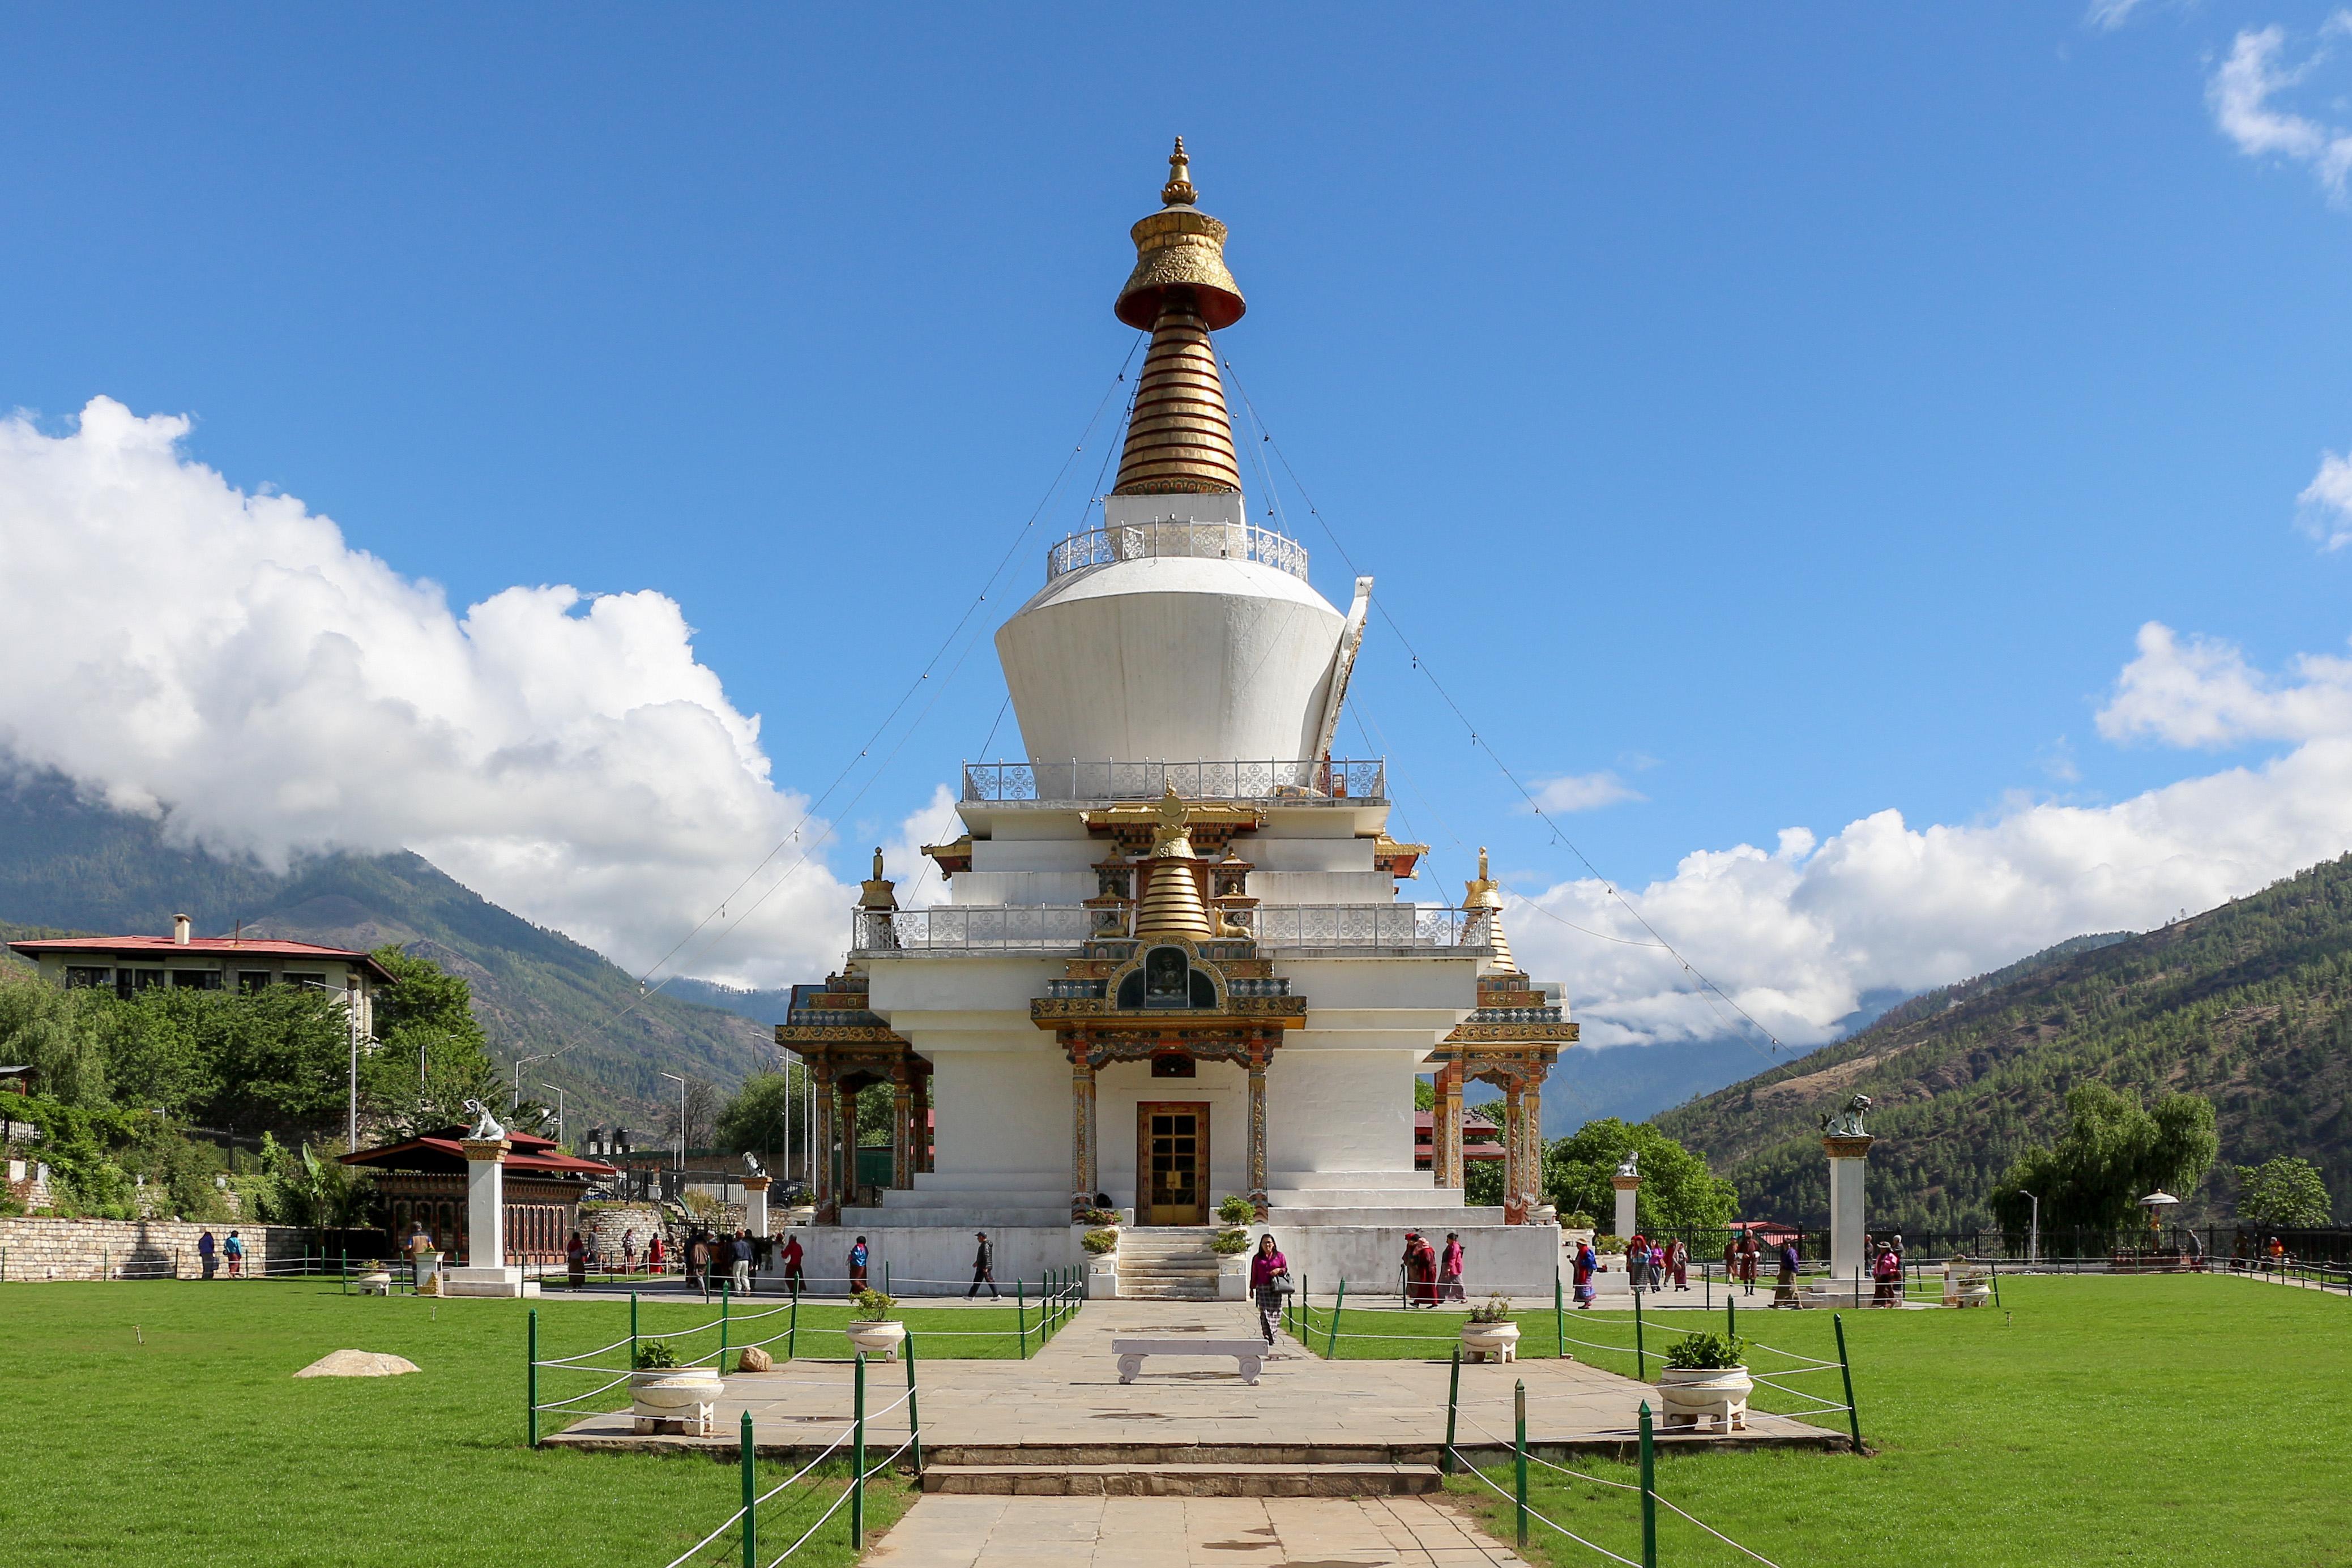 Memorial Chorten, Thimphu - Wikipedia